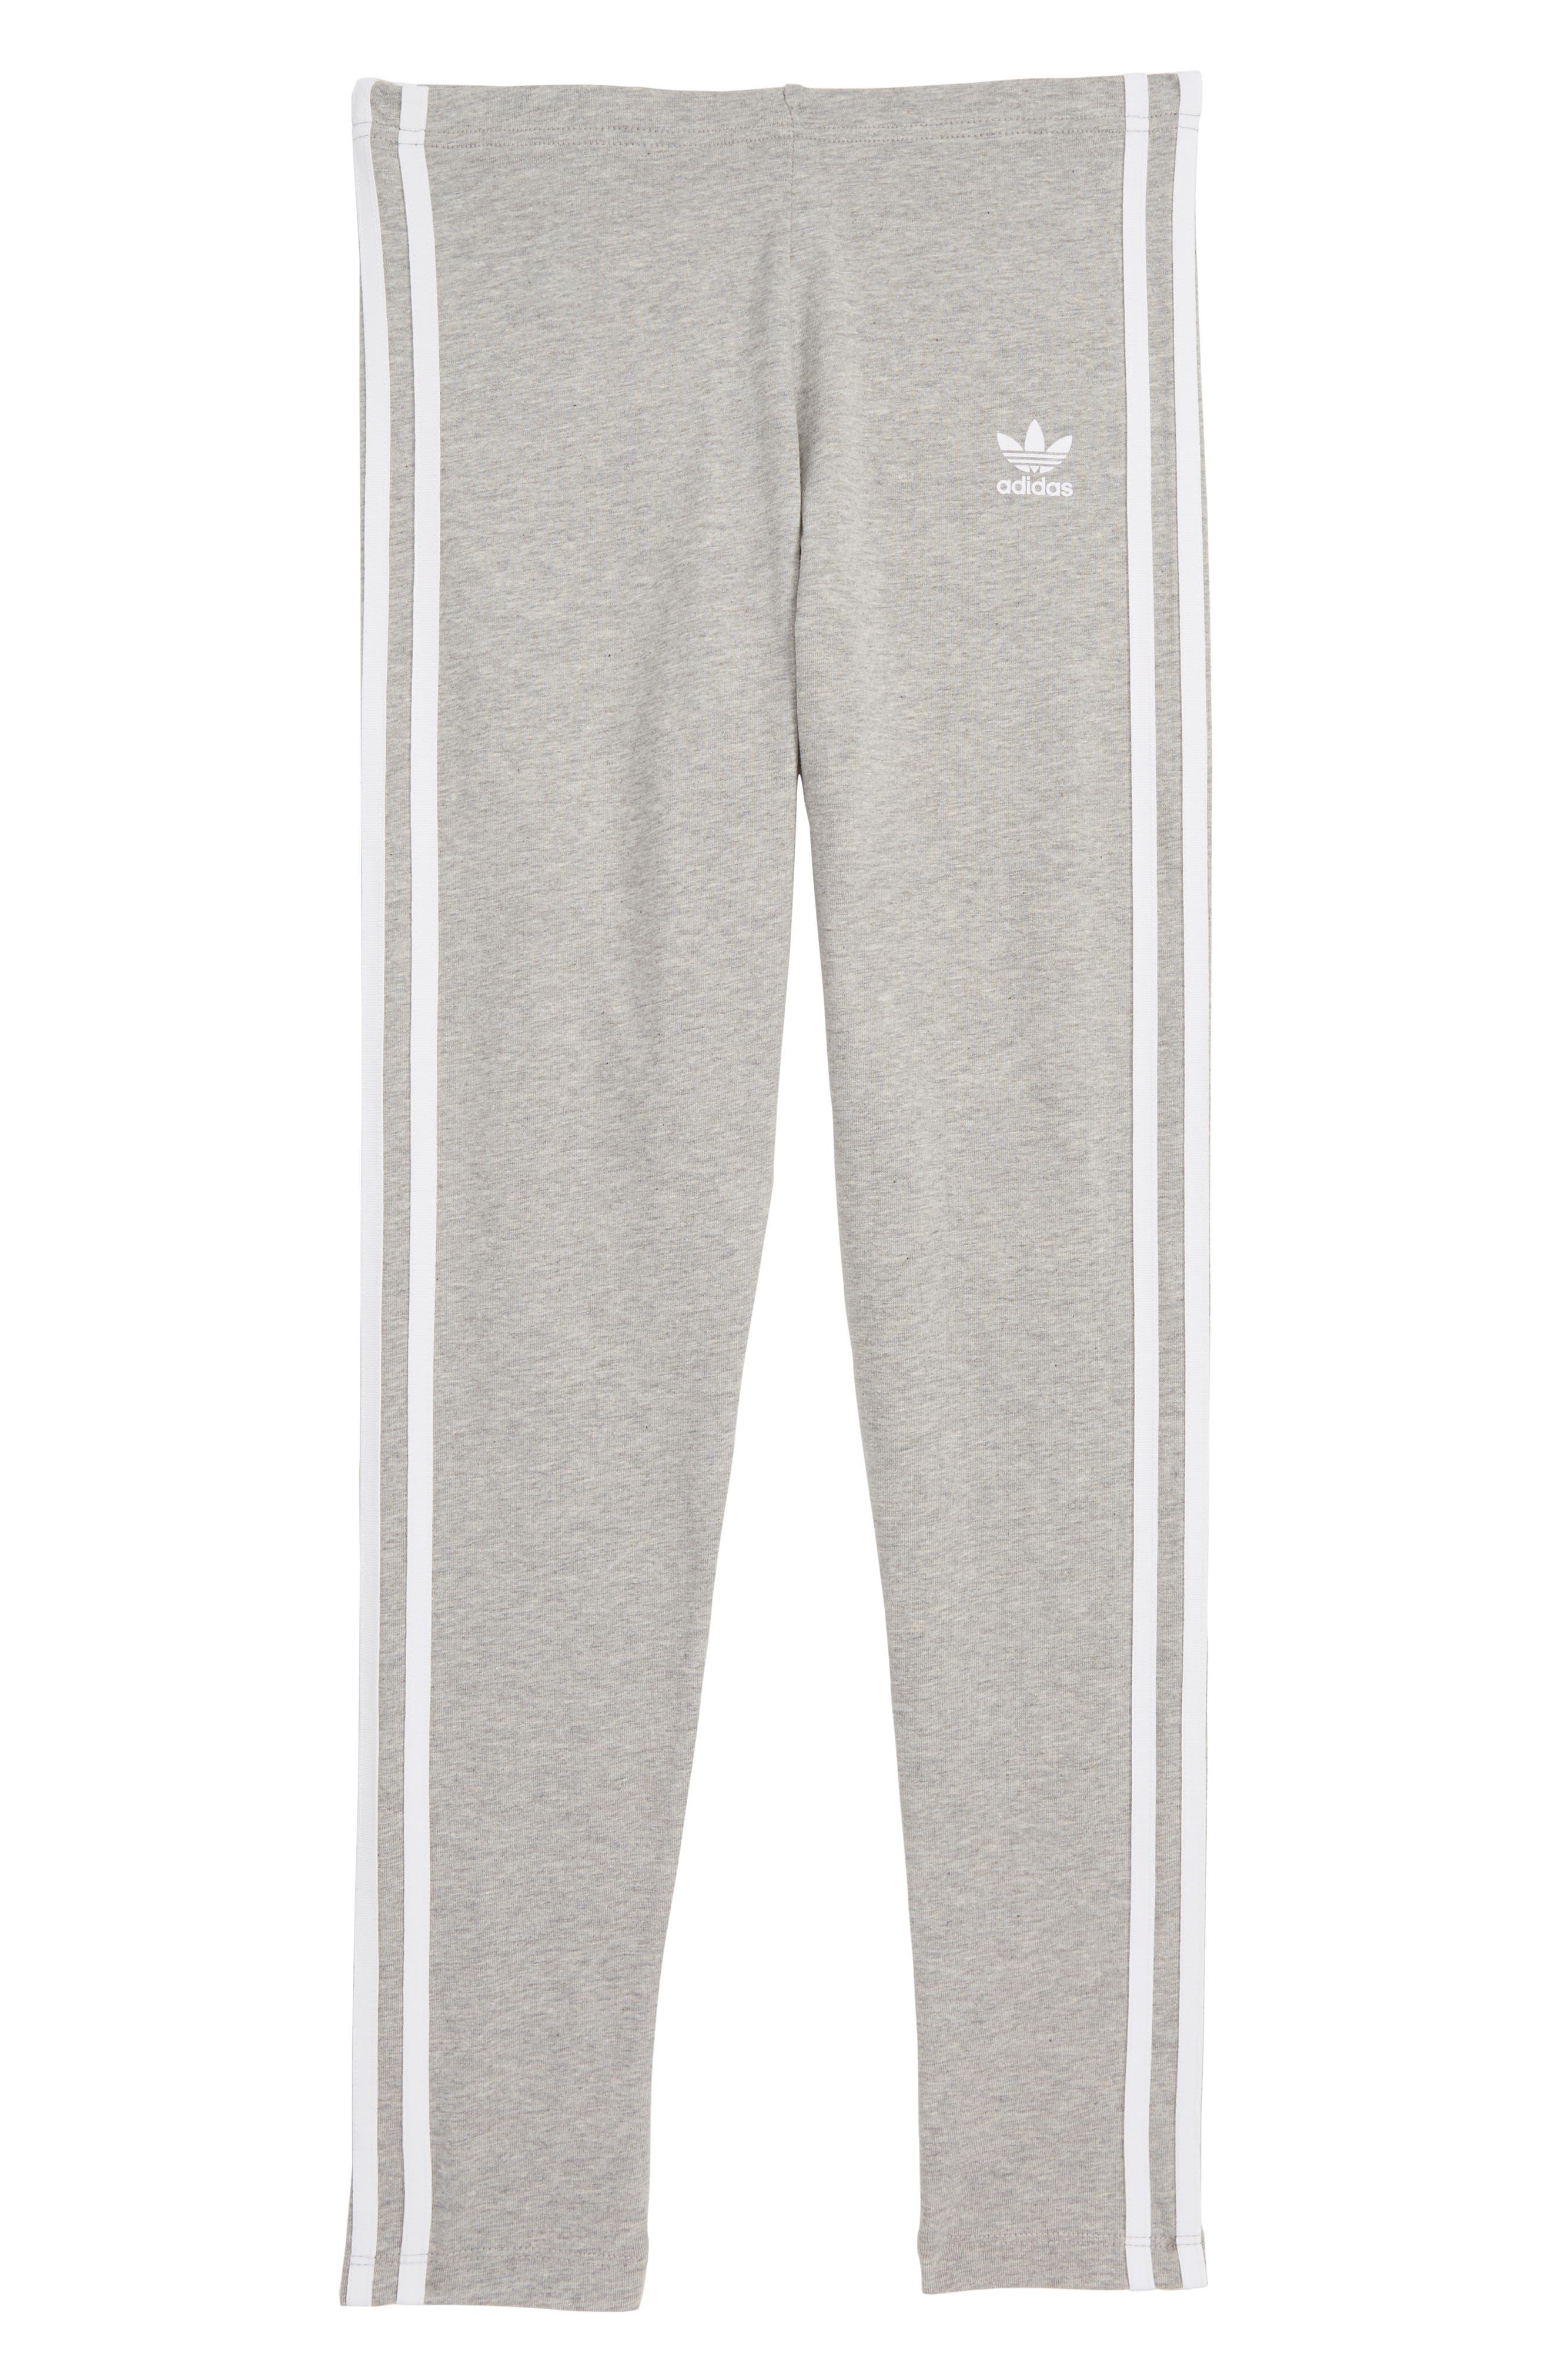 ADIDAS ORIGINALS, adidas 3-Stripes Leggings, Main thumbnail 1, color, 035